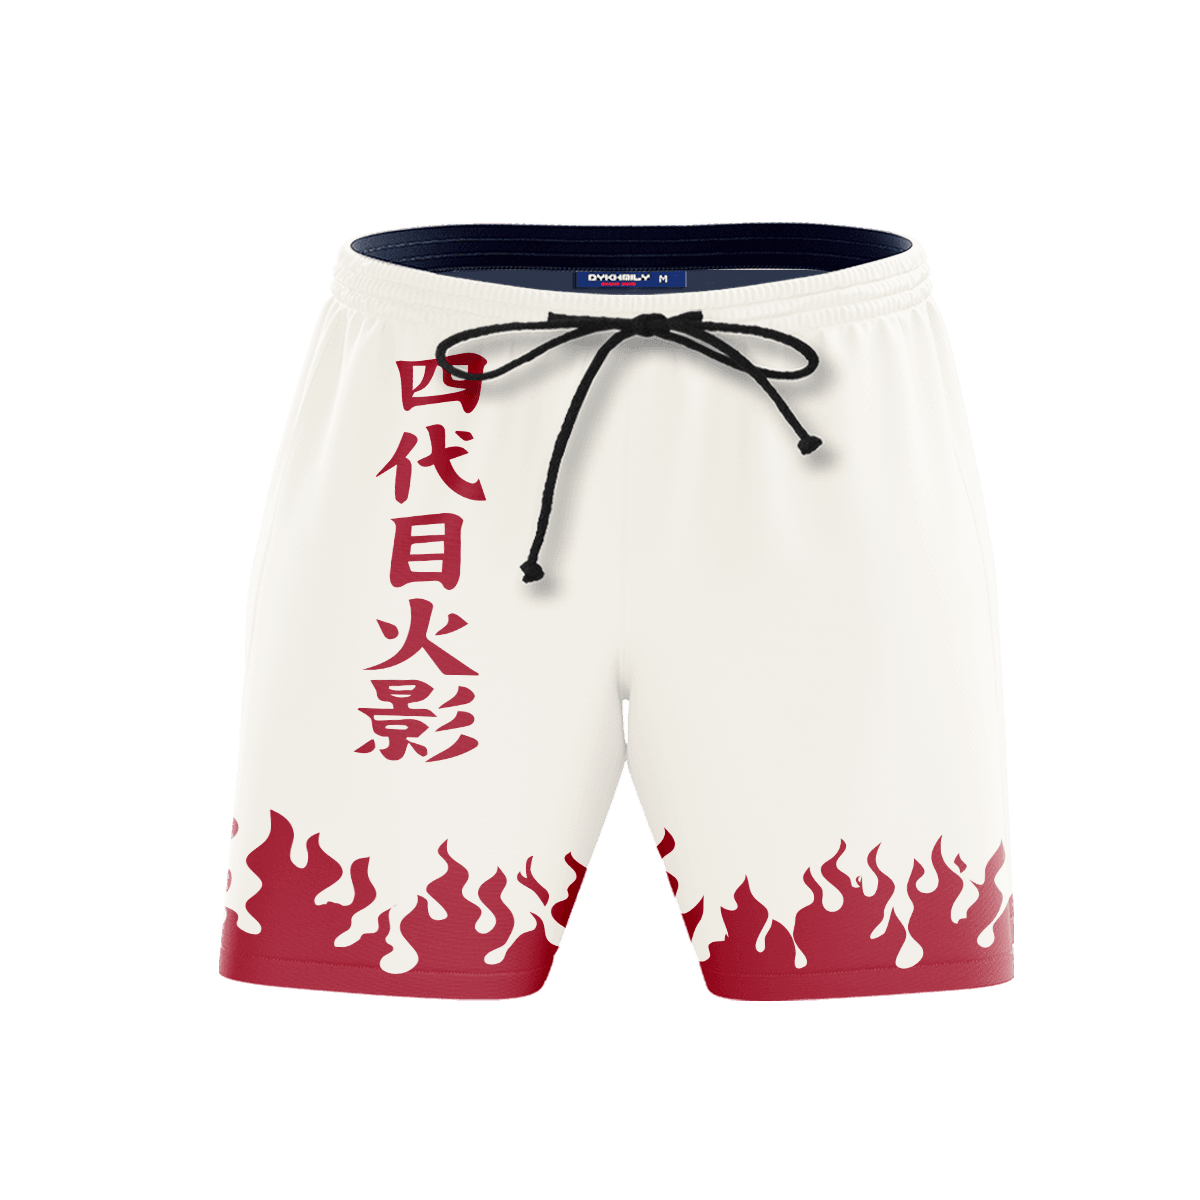 Hokage Beach Shorts FDM3107 S Official Anime Swimsuit Merch